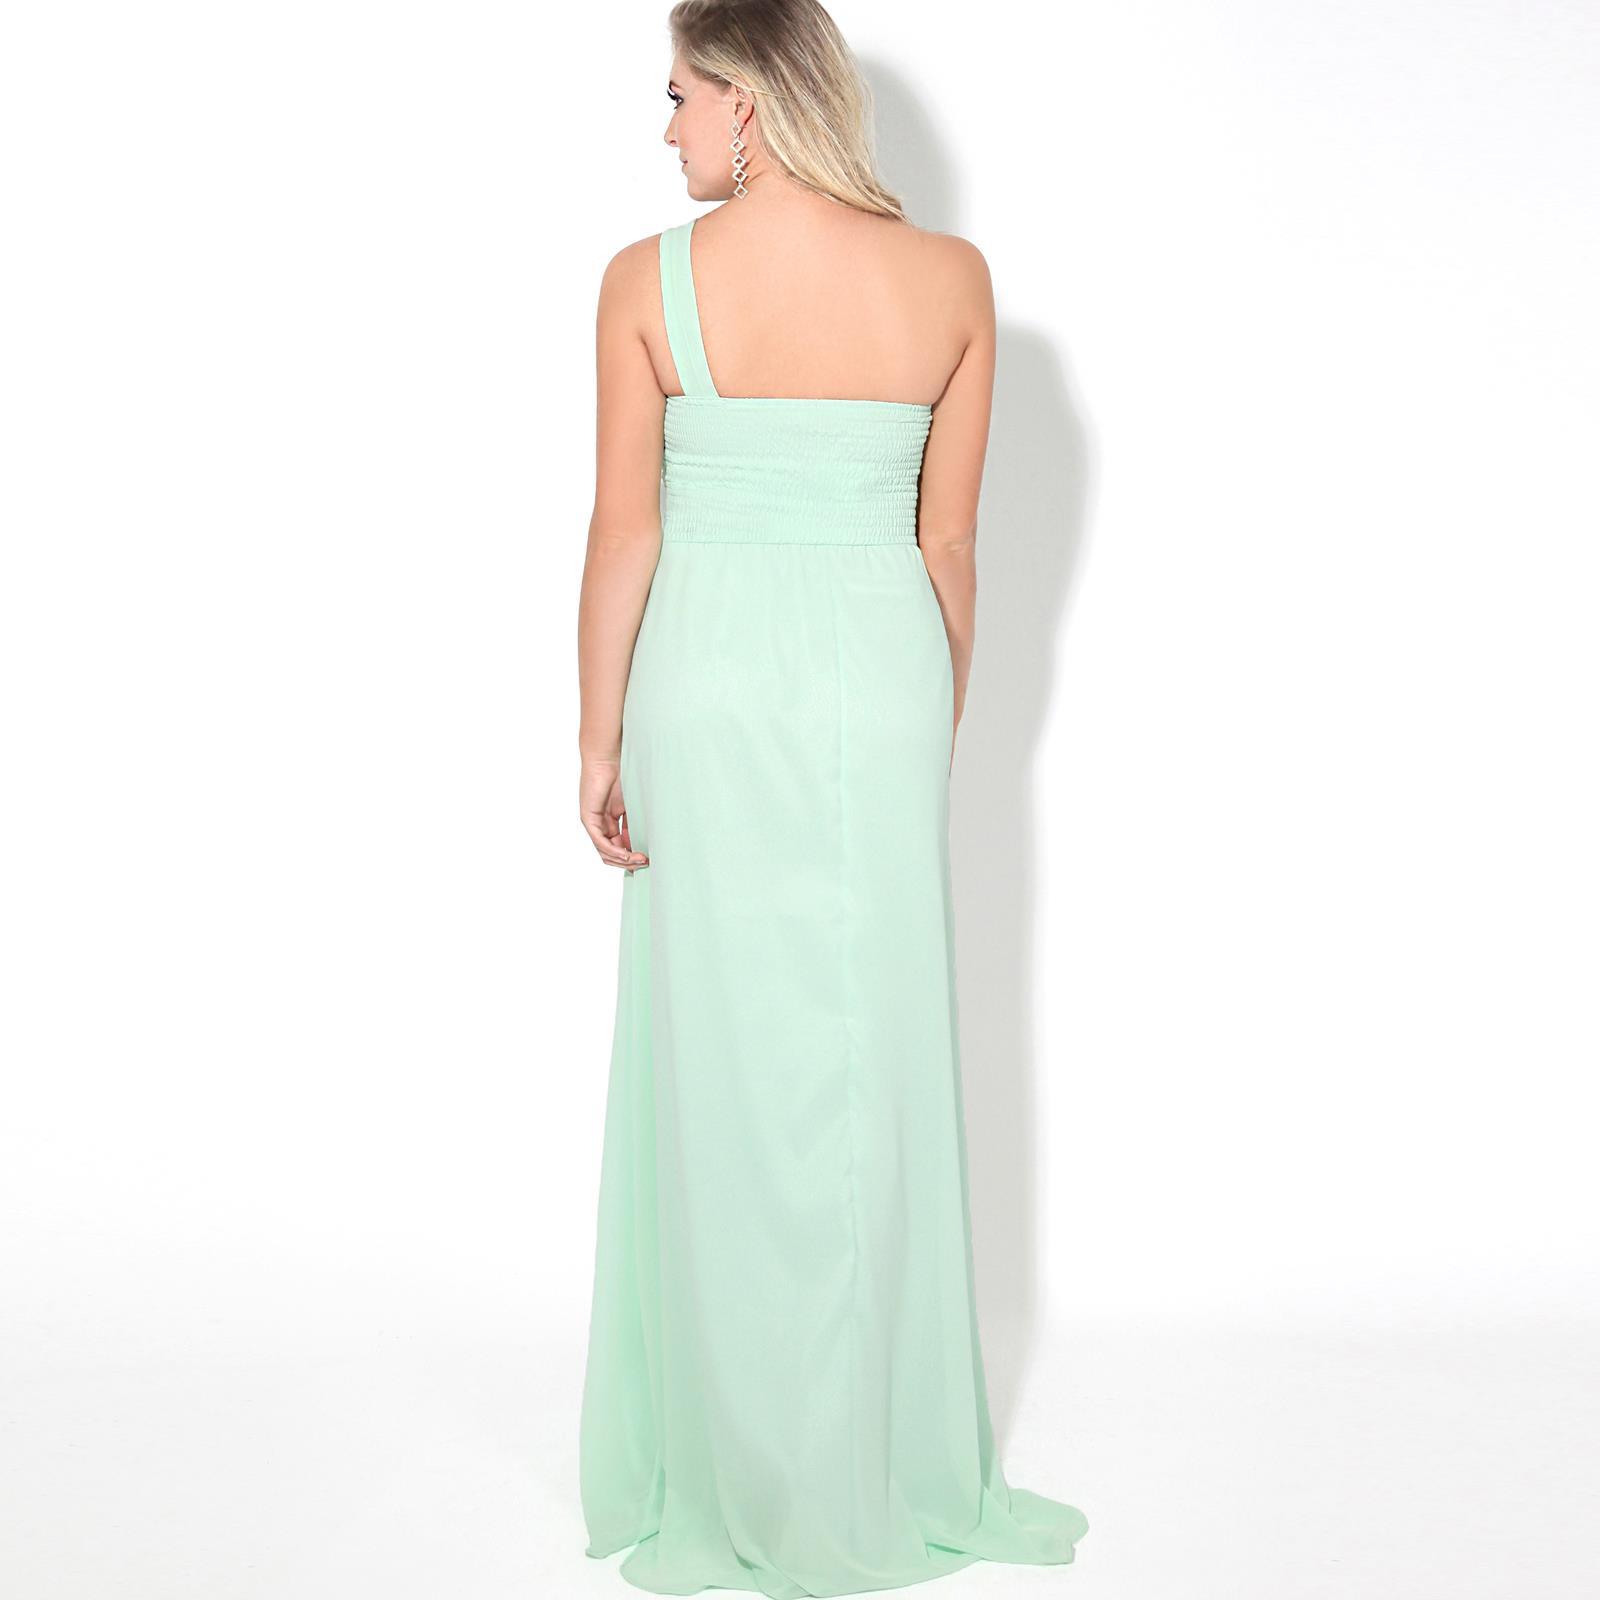 Womens-Wedding-Bridesmaid-Prom-Dress-Formal-One-Off-Shoulder-Long-Evening-8-18 thumbnail 38